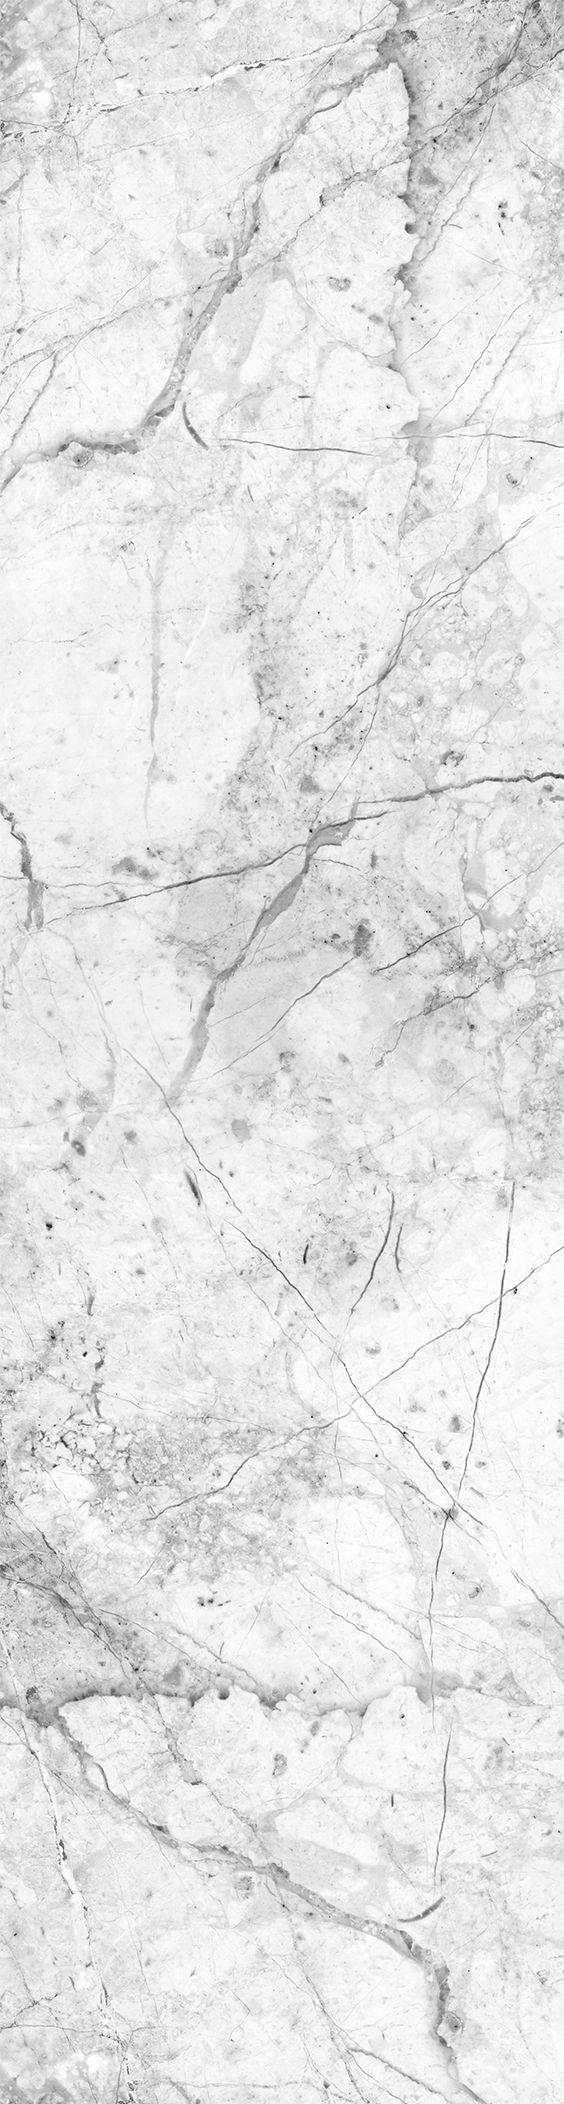 Textured White Marble Wallpaper Muralswallpaper Marble